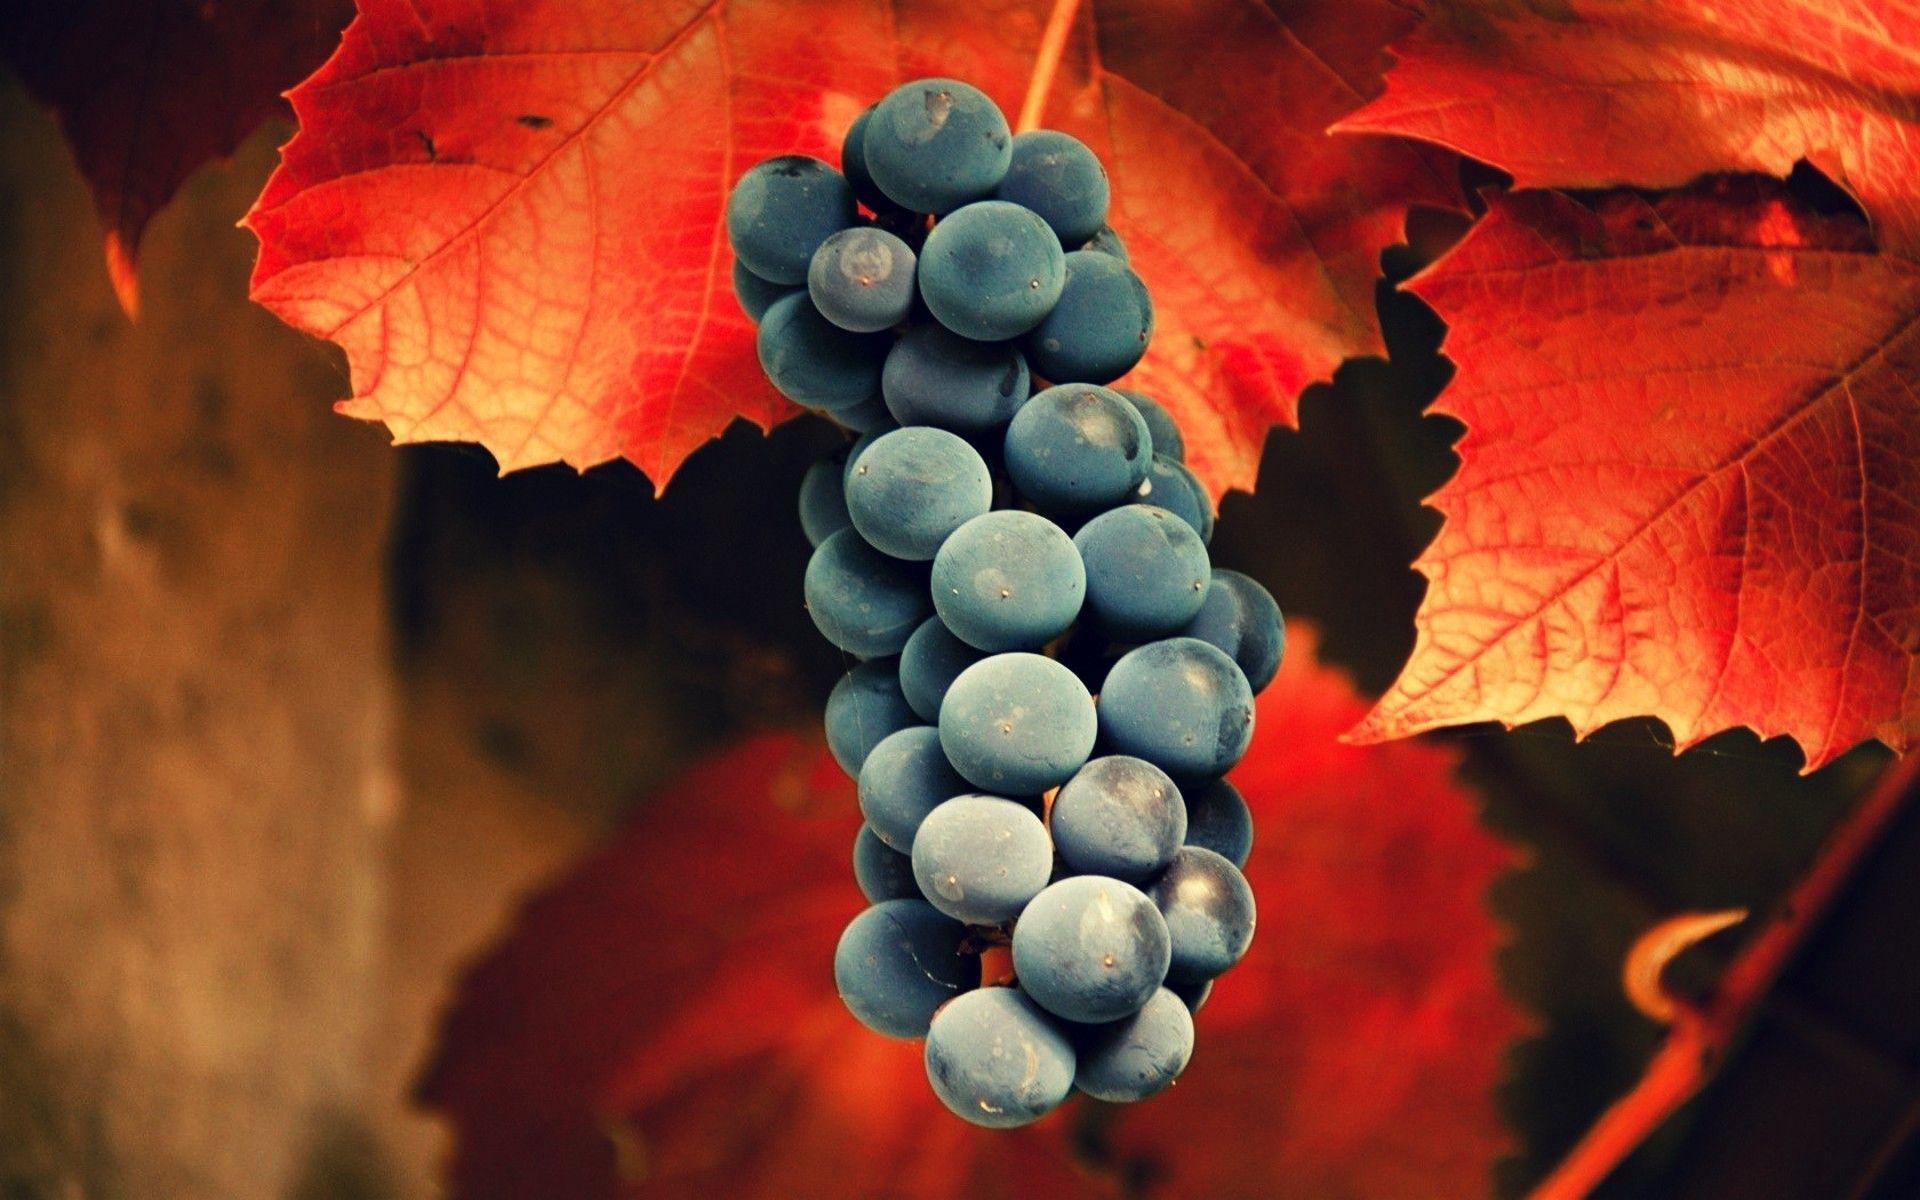 Grapes Wallpapers - Wallpaper Cave